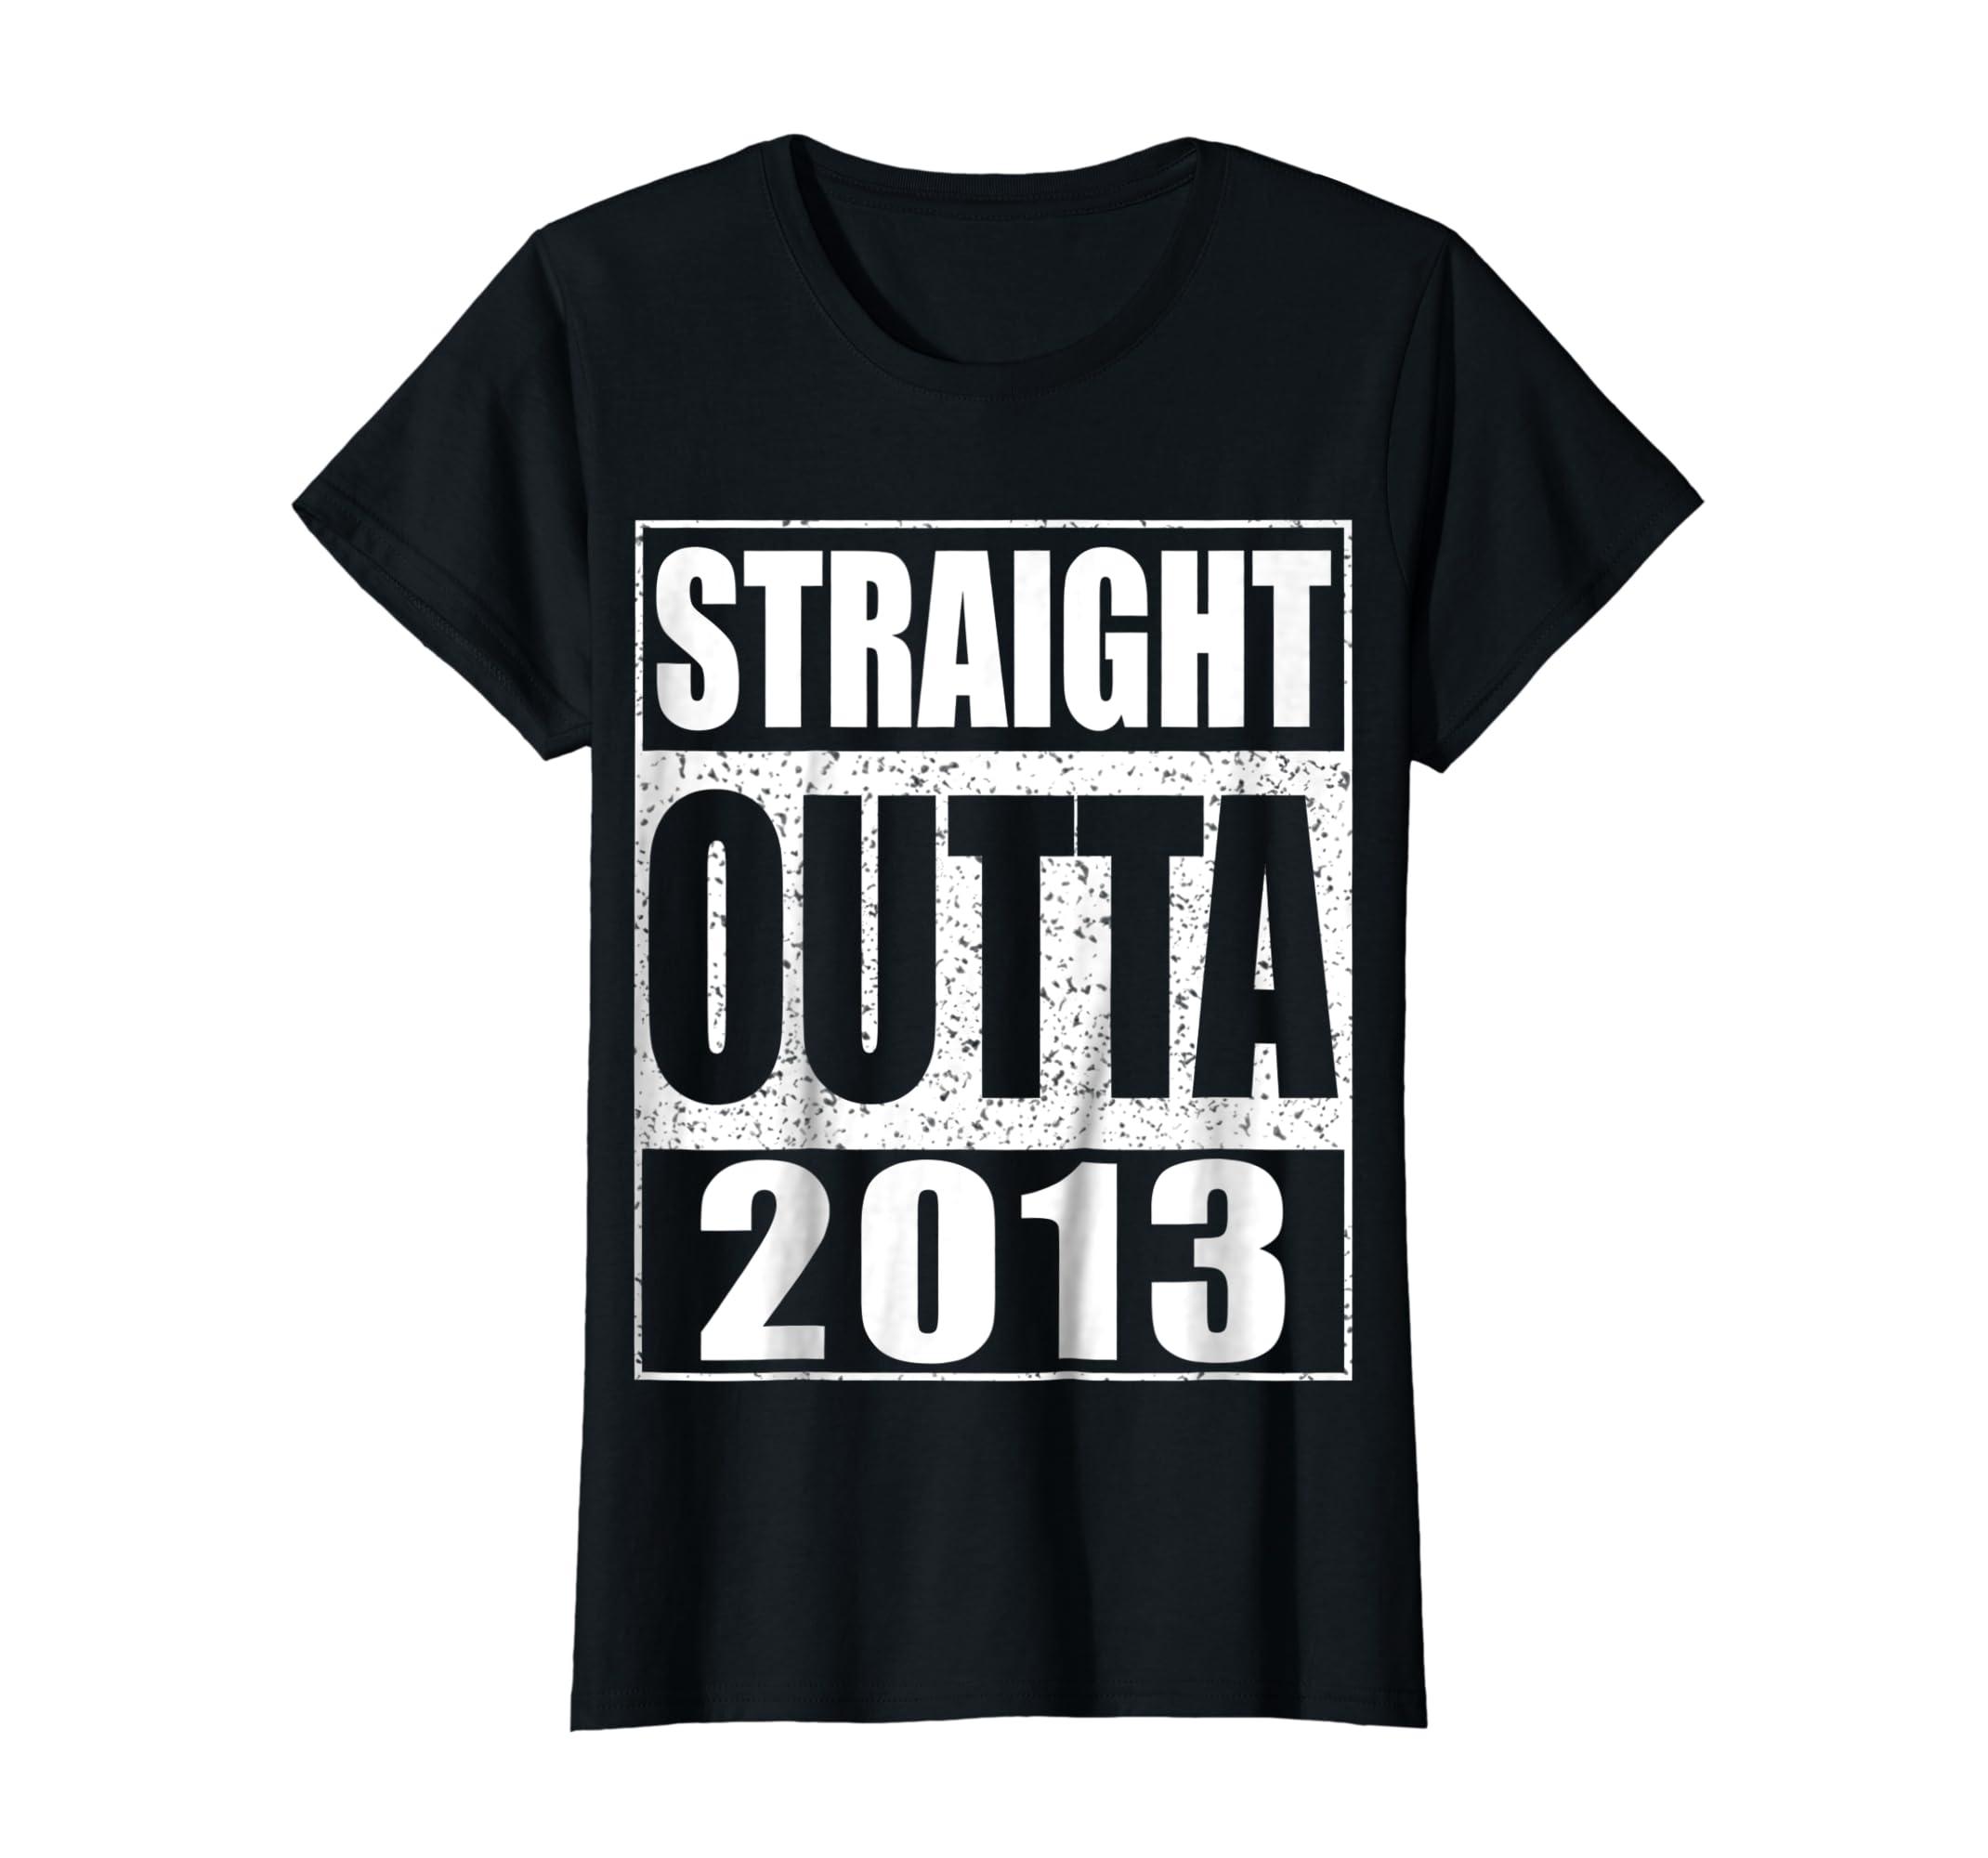 Kids Straight Outta 2013 T-Shirt 6th Birthday Gift Shirt-Women's T-Shirt-Black